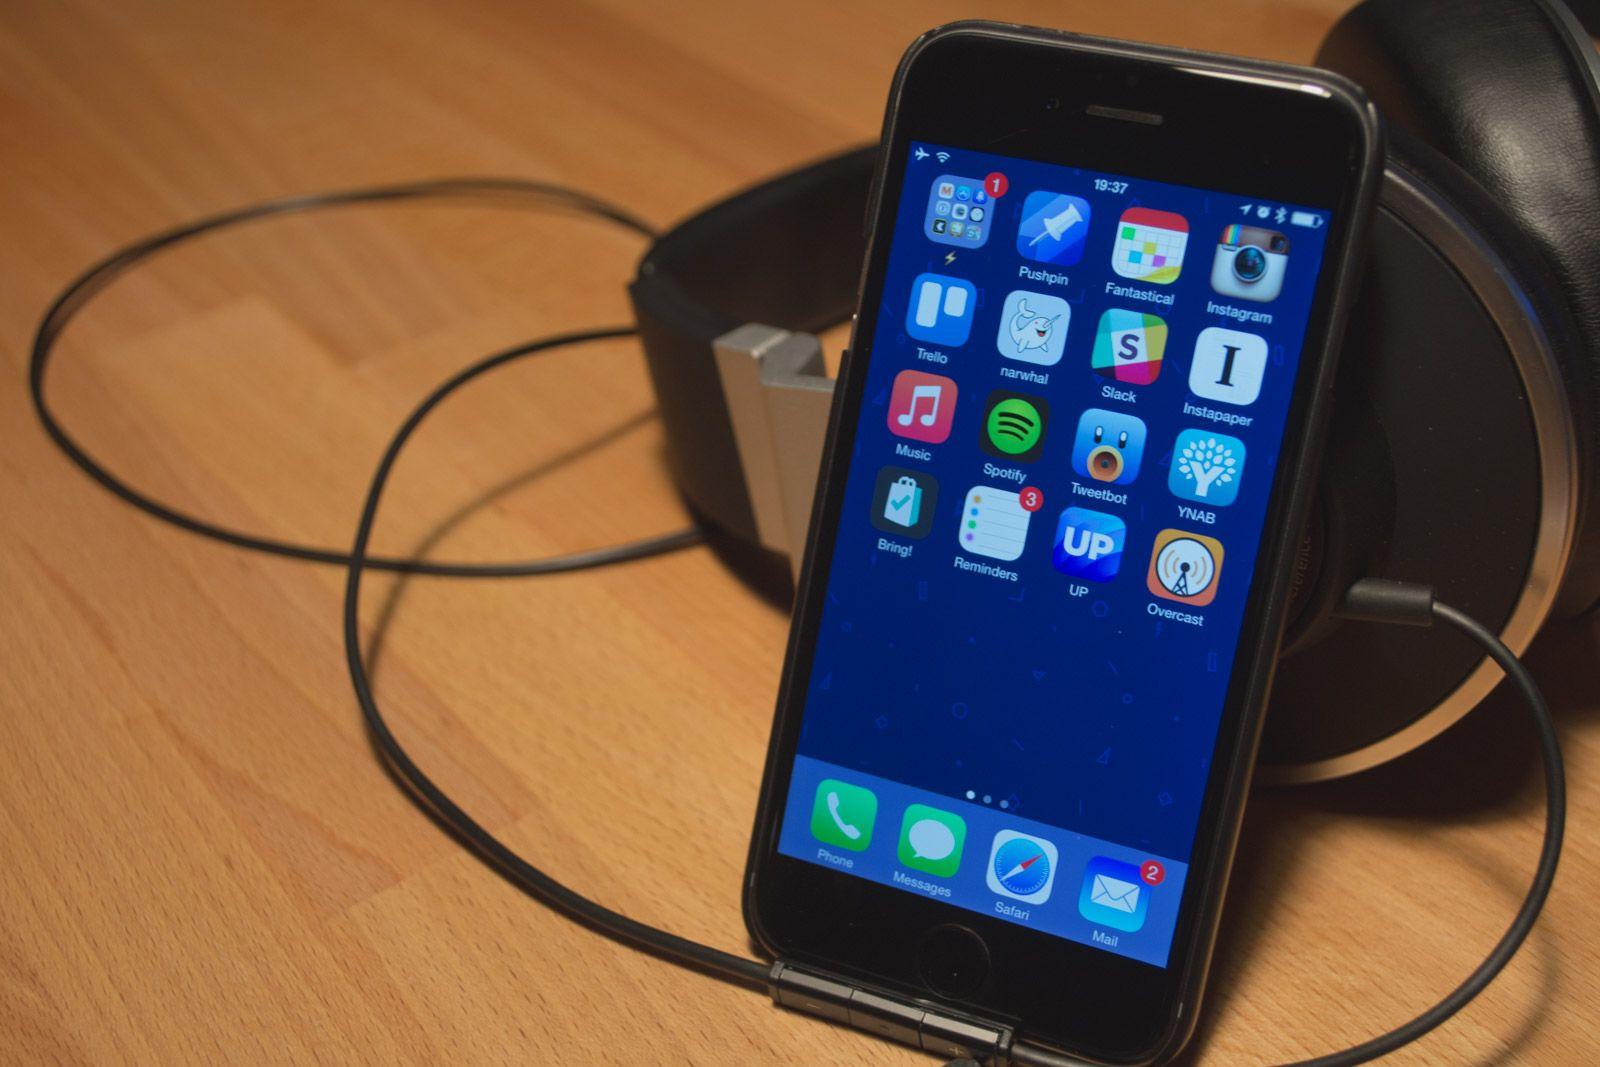 Photo of my iPhone Homescreen